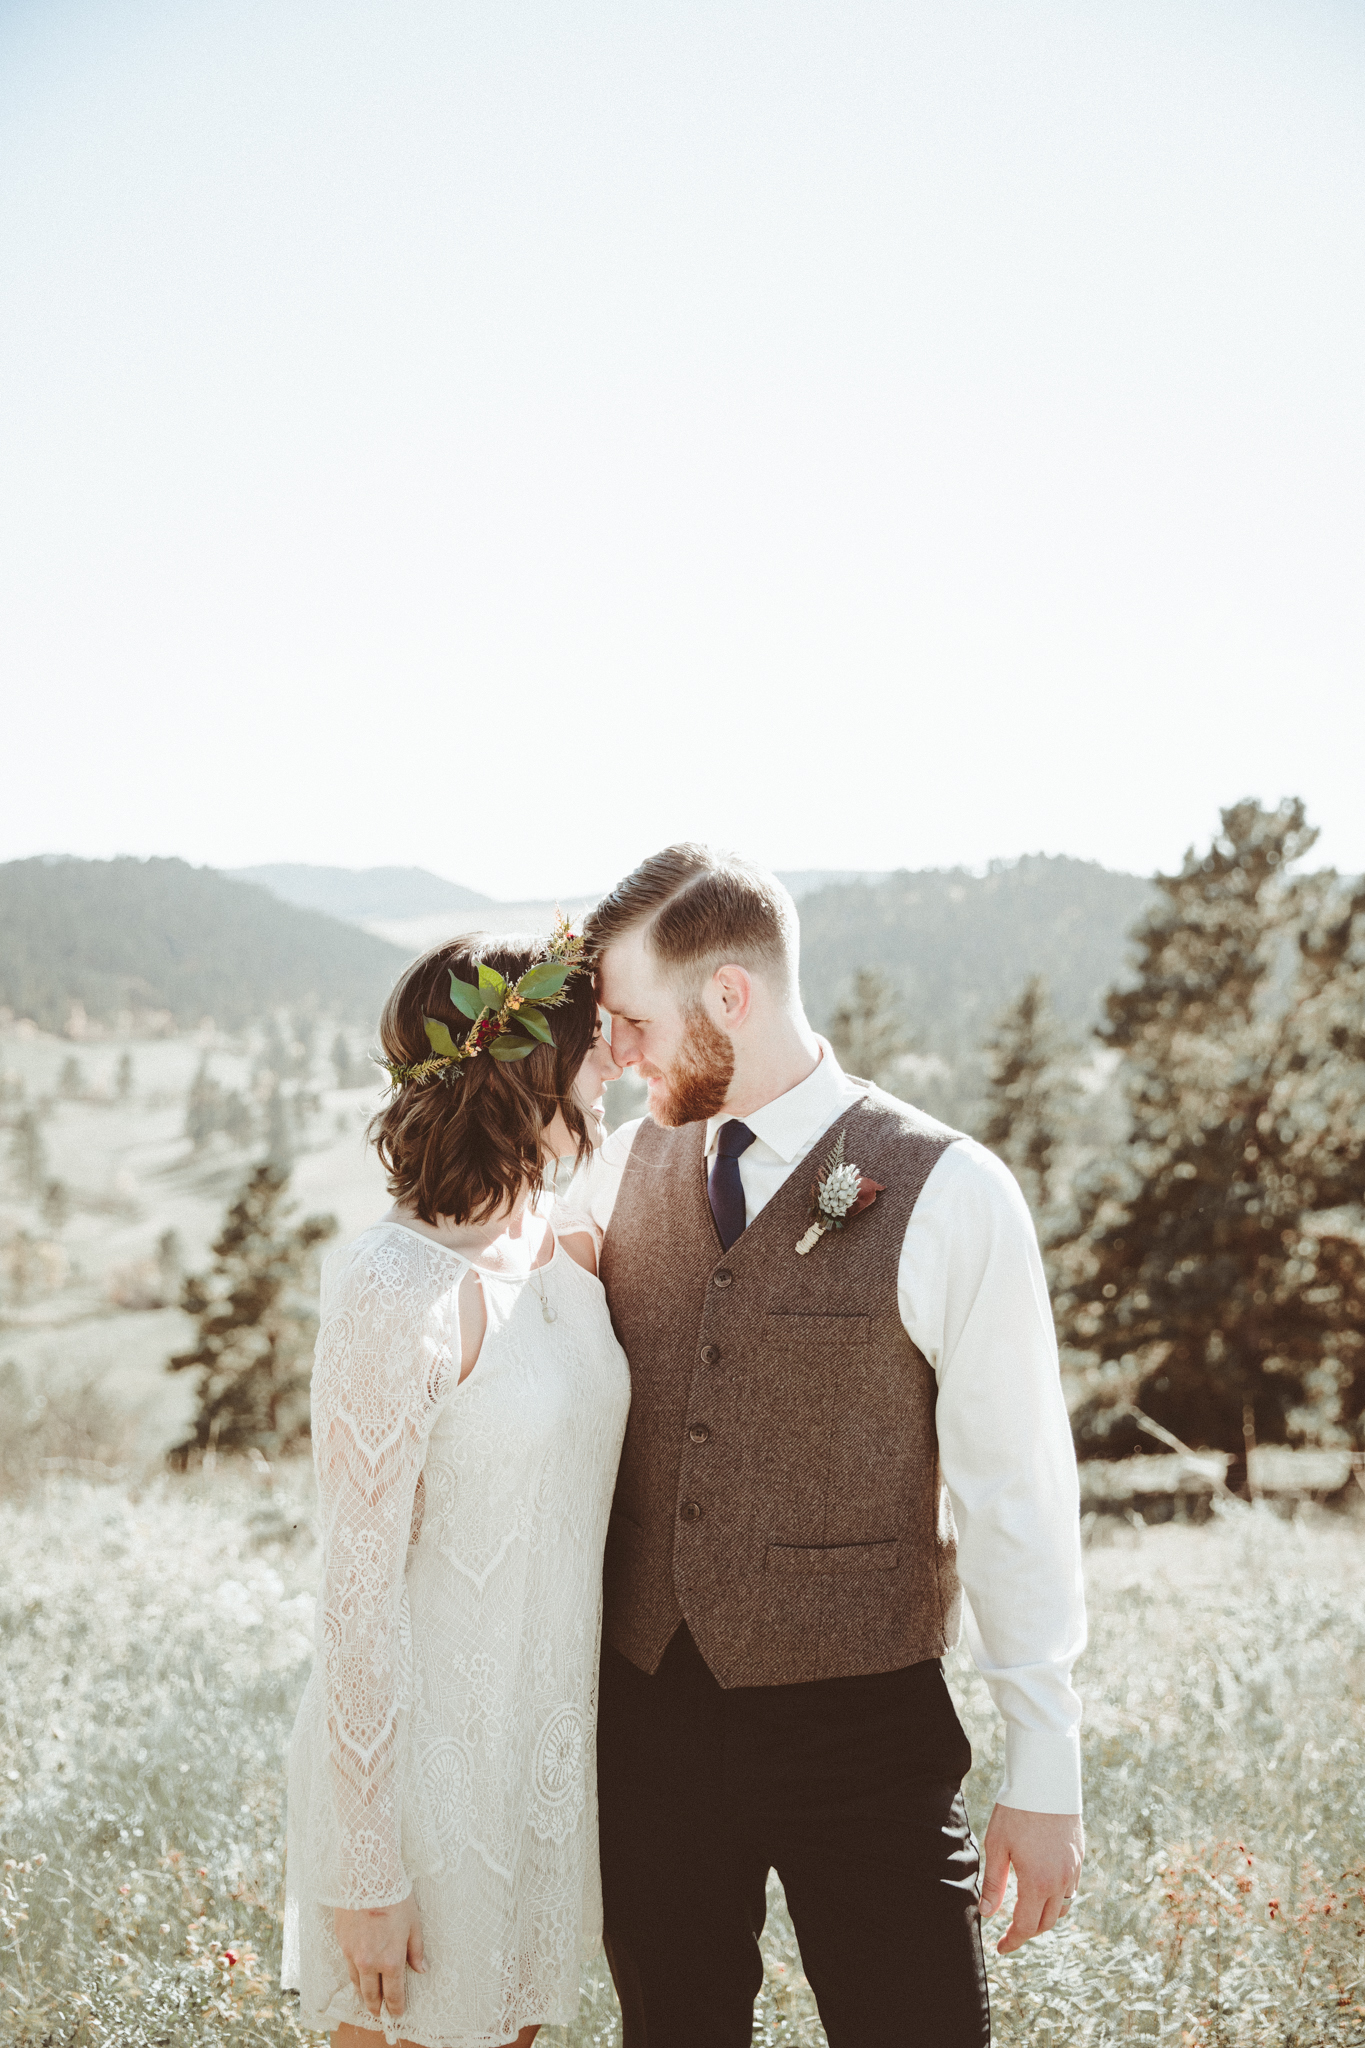 madi | mountain anniversary elopement | south dakota | black hills | boho lace (13 of 23).jpg